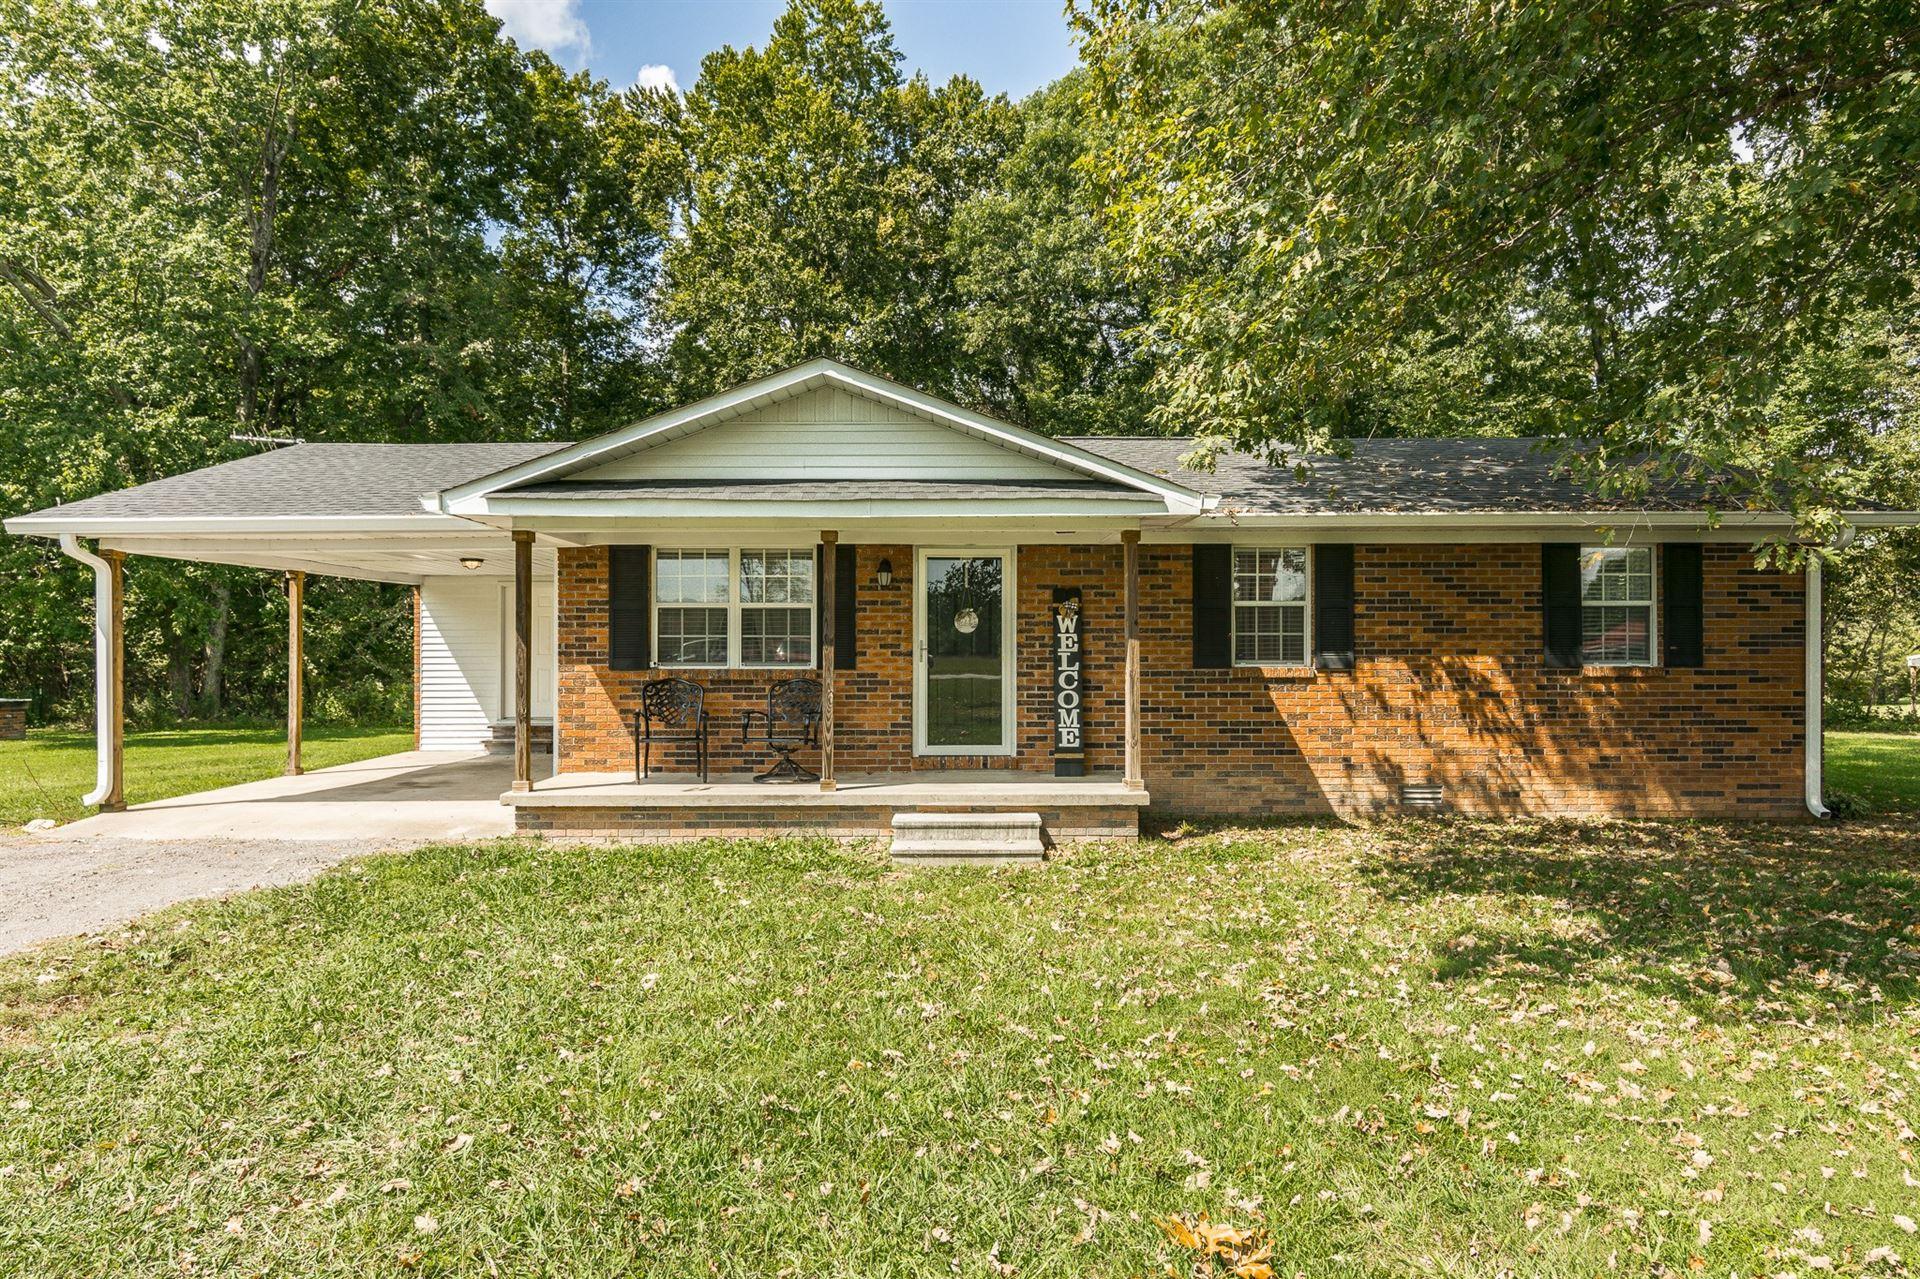 1969 Pleasant Grove Rd, Westmoreland, TN 37186 - MLS#: 2292046